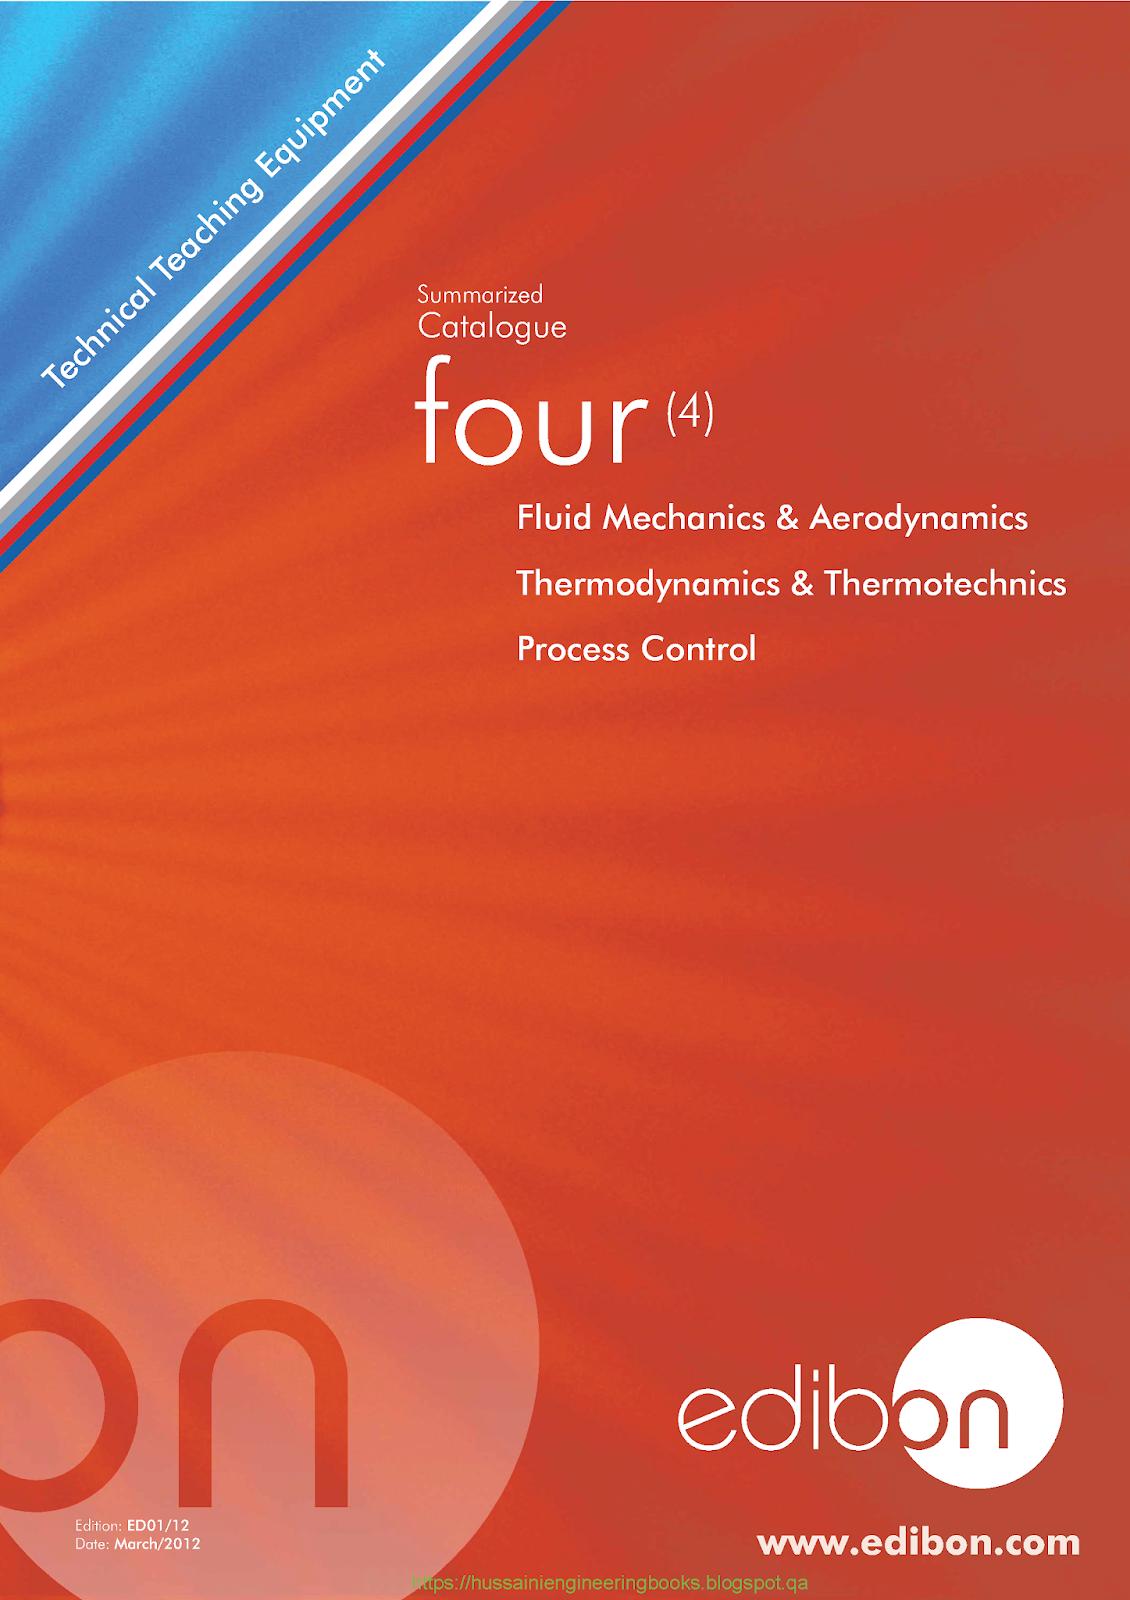 Catalogue four Fluid Mechanics and Aerodynamics